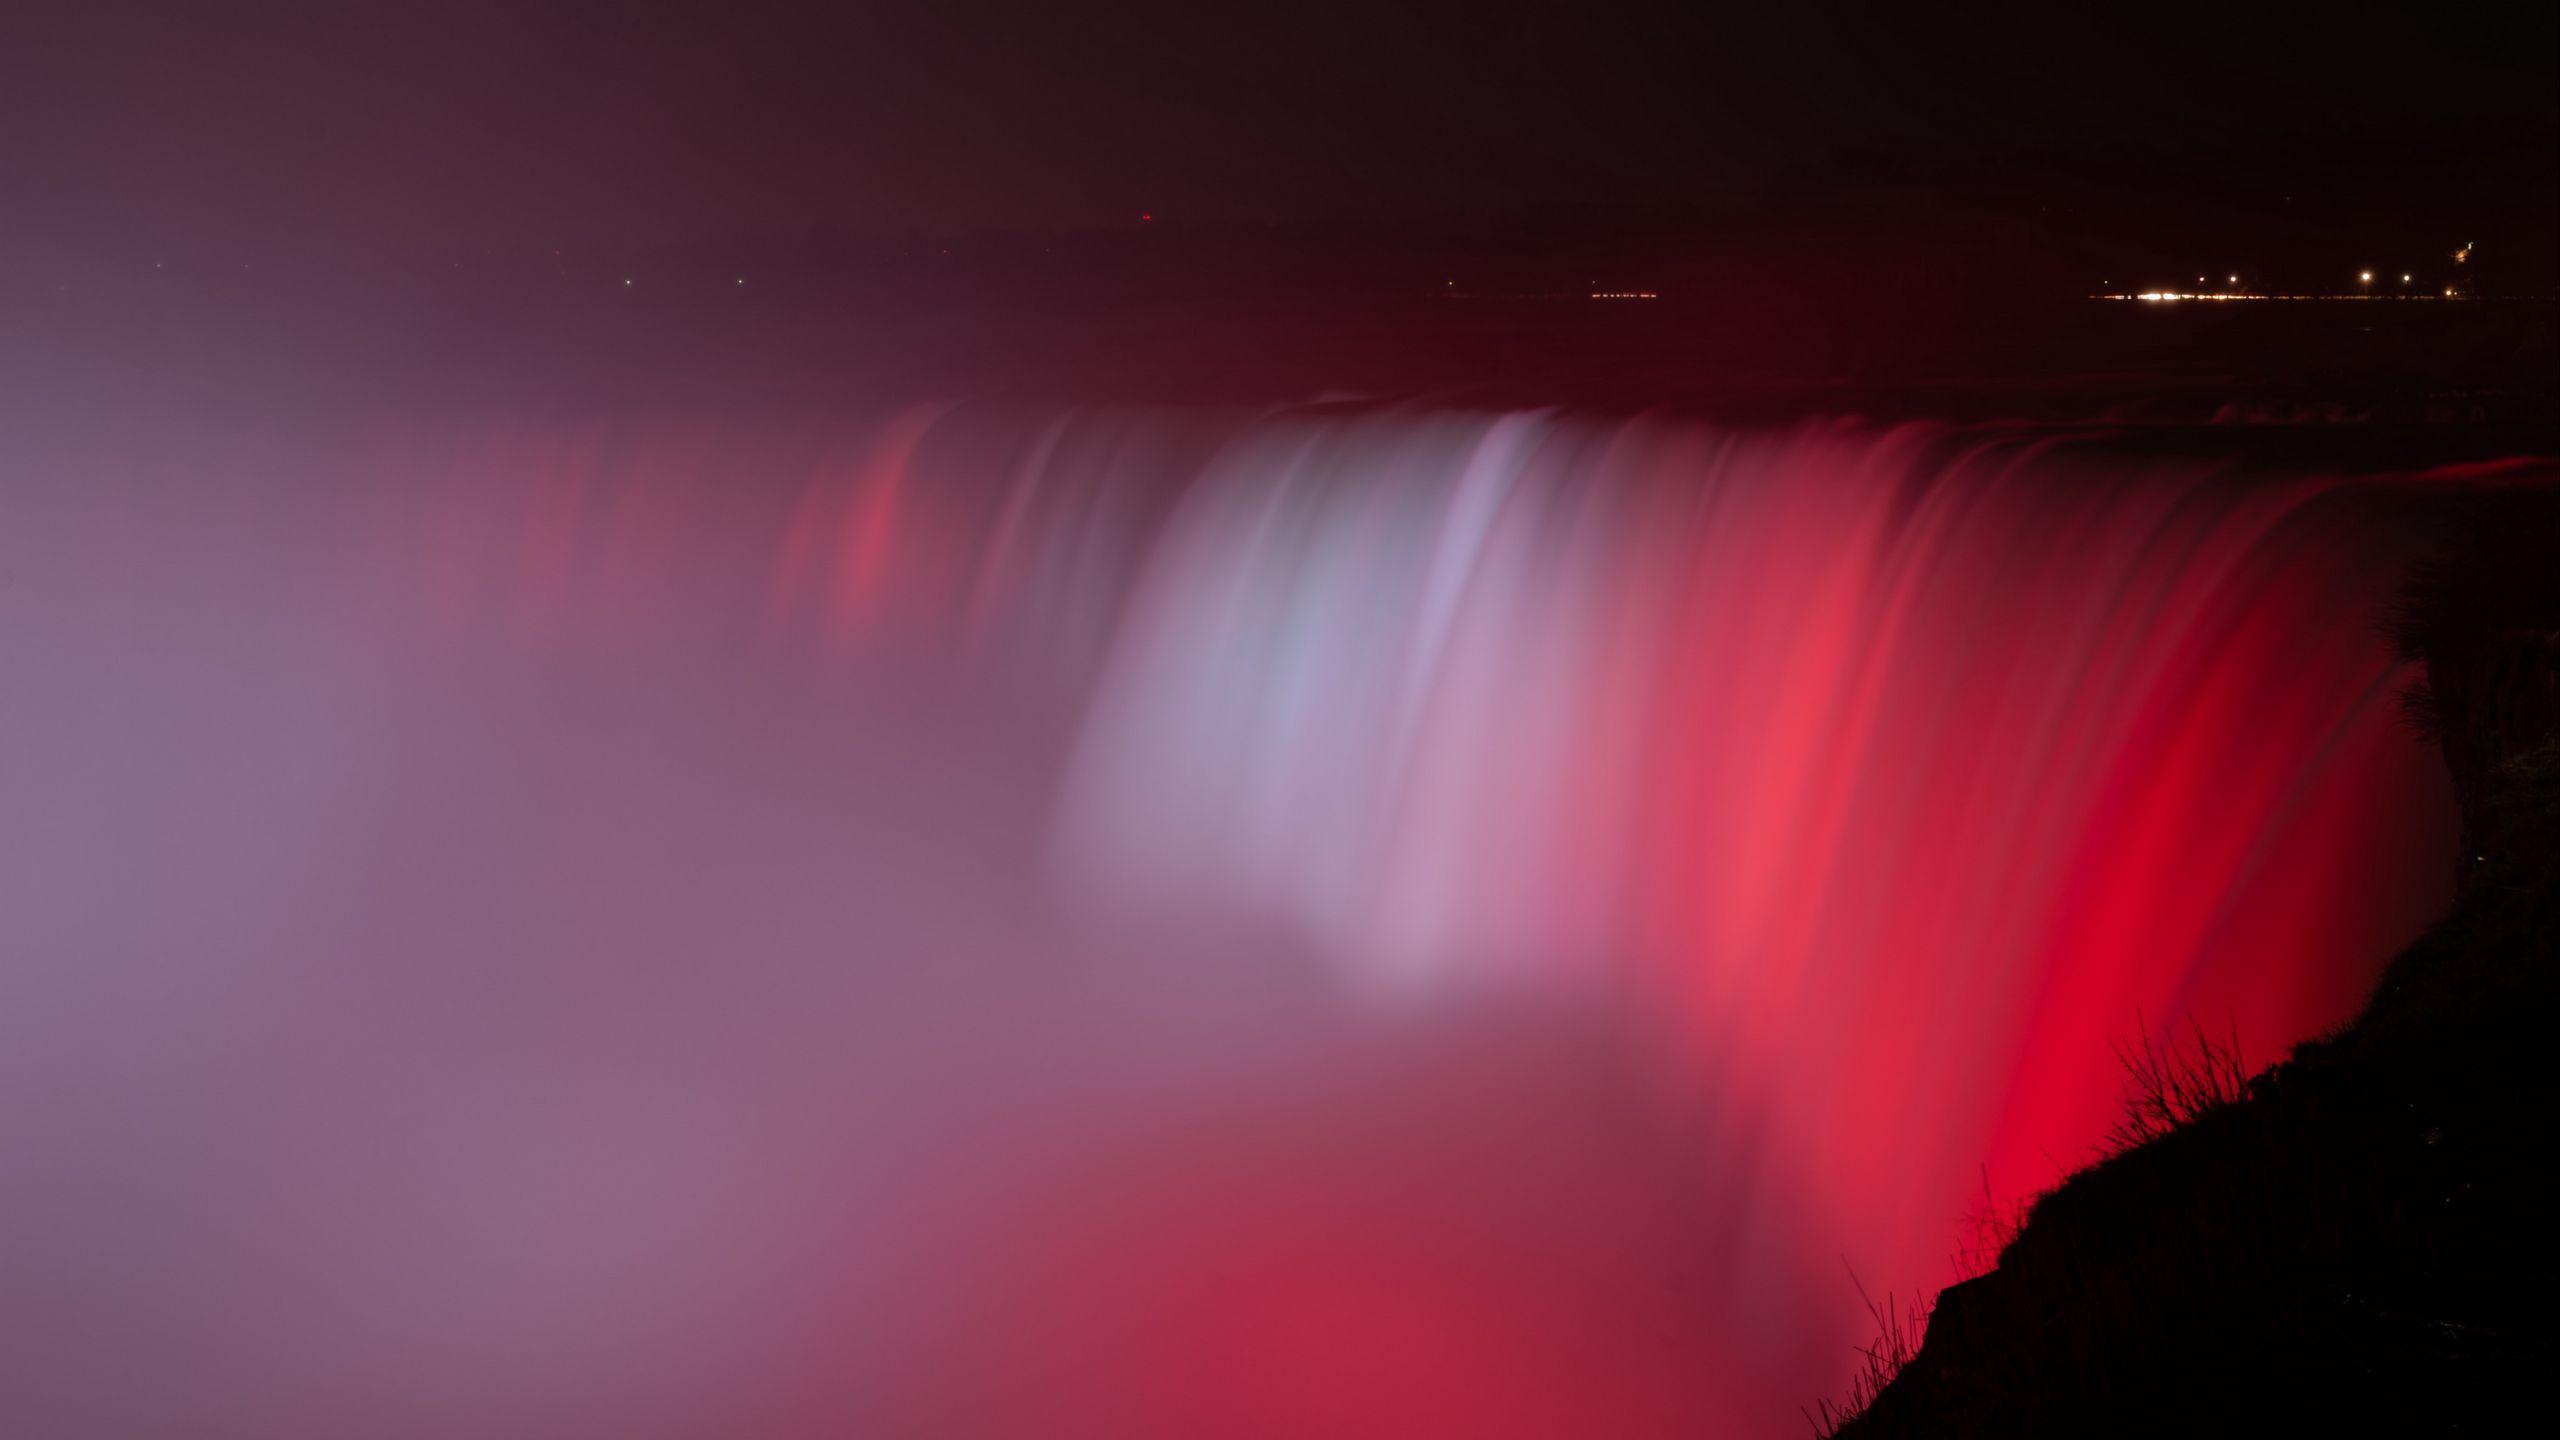 2560x1440 Wallpaper waterfall, fog, backlight, red, dark